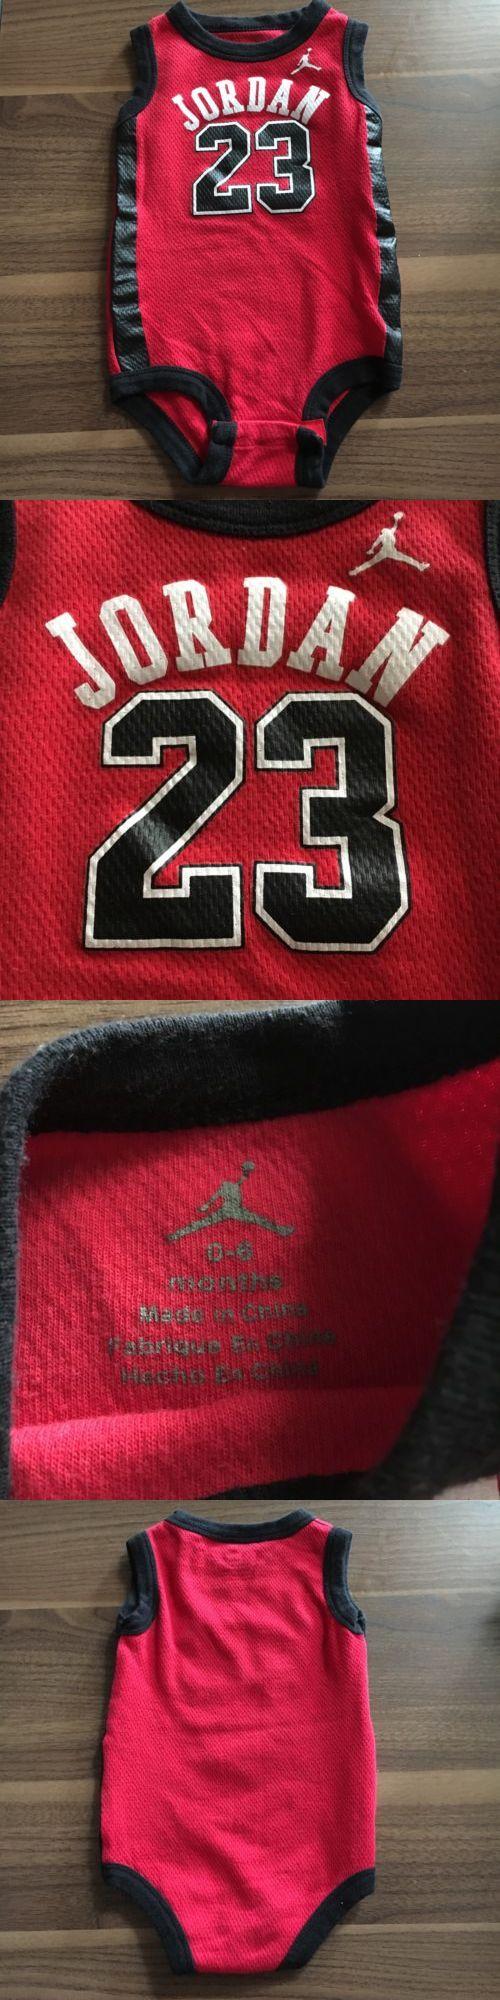 Michael Jordan Baby Clothing: Air Jordan 23 Michael Jordan Black And Red Baby Onesie Jersey Size 0-6 Months BUY IT NOW ONLY: $14.99